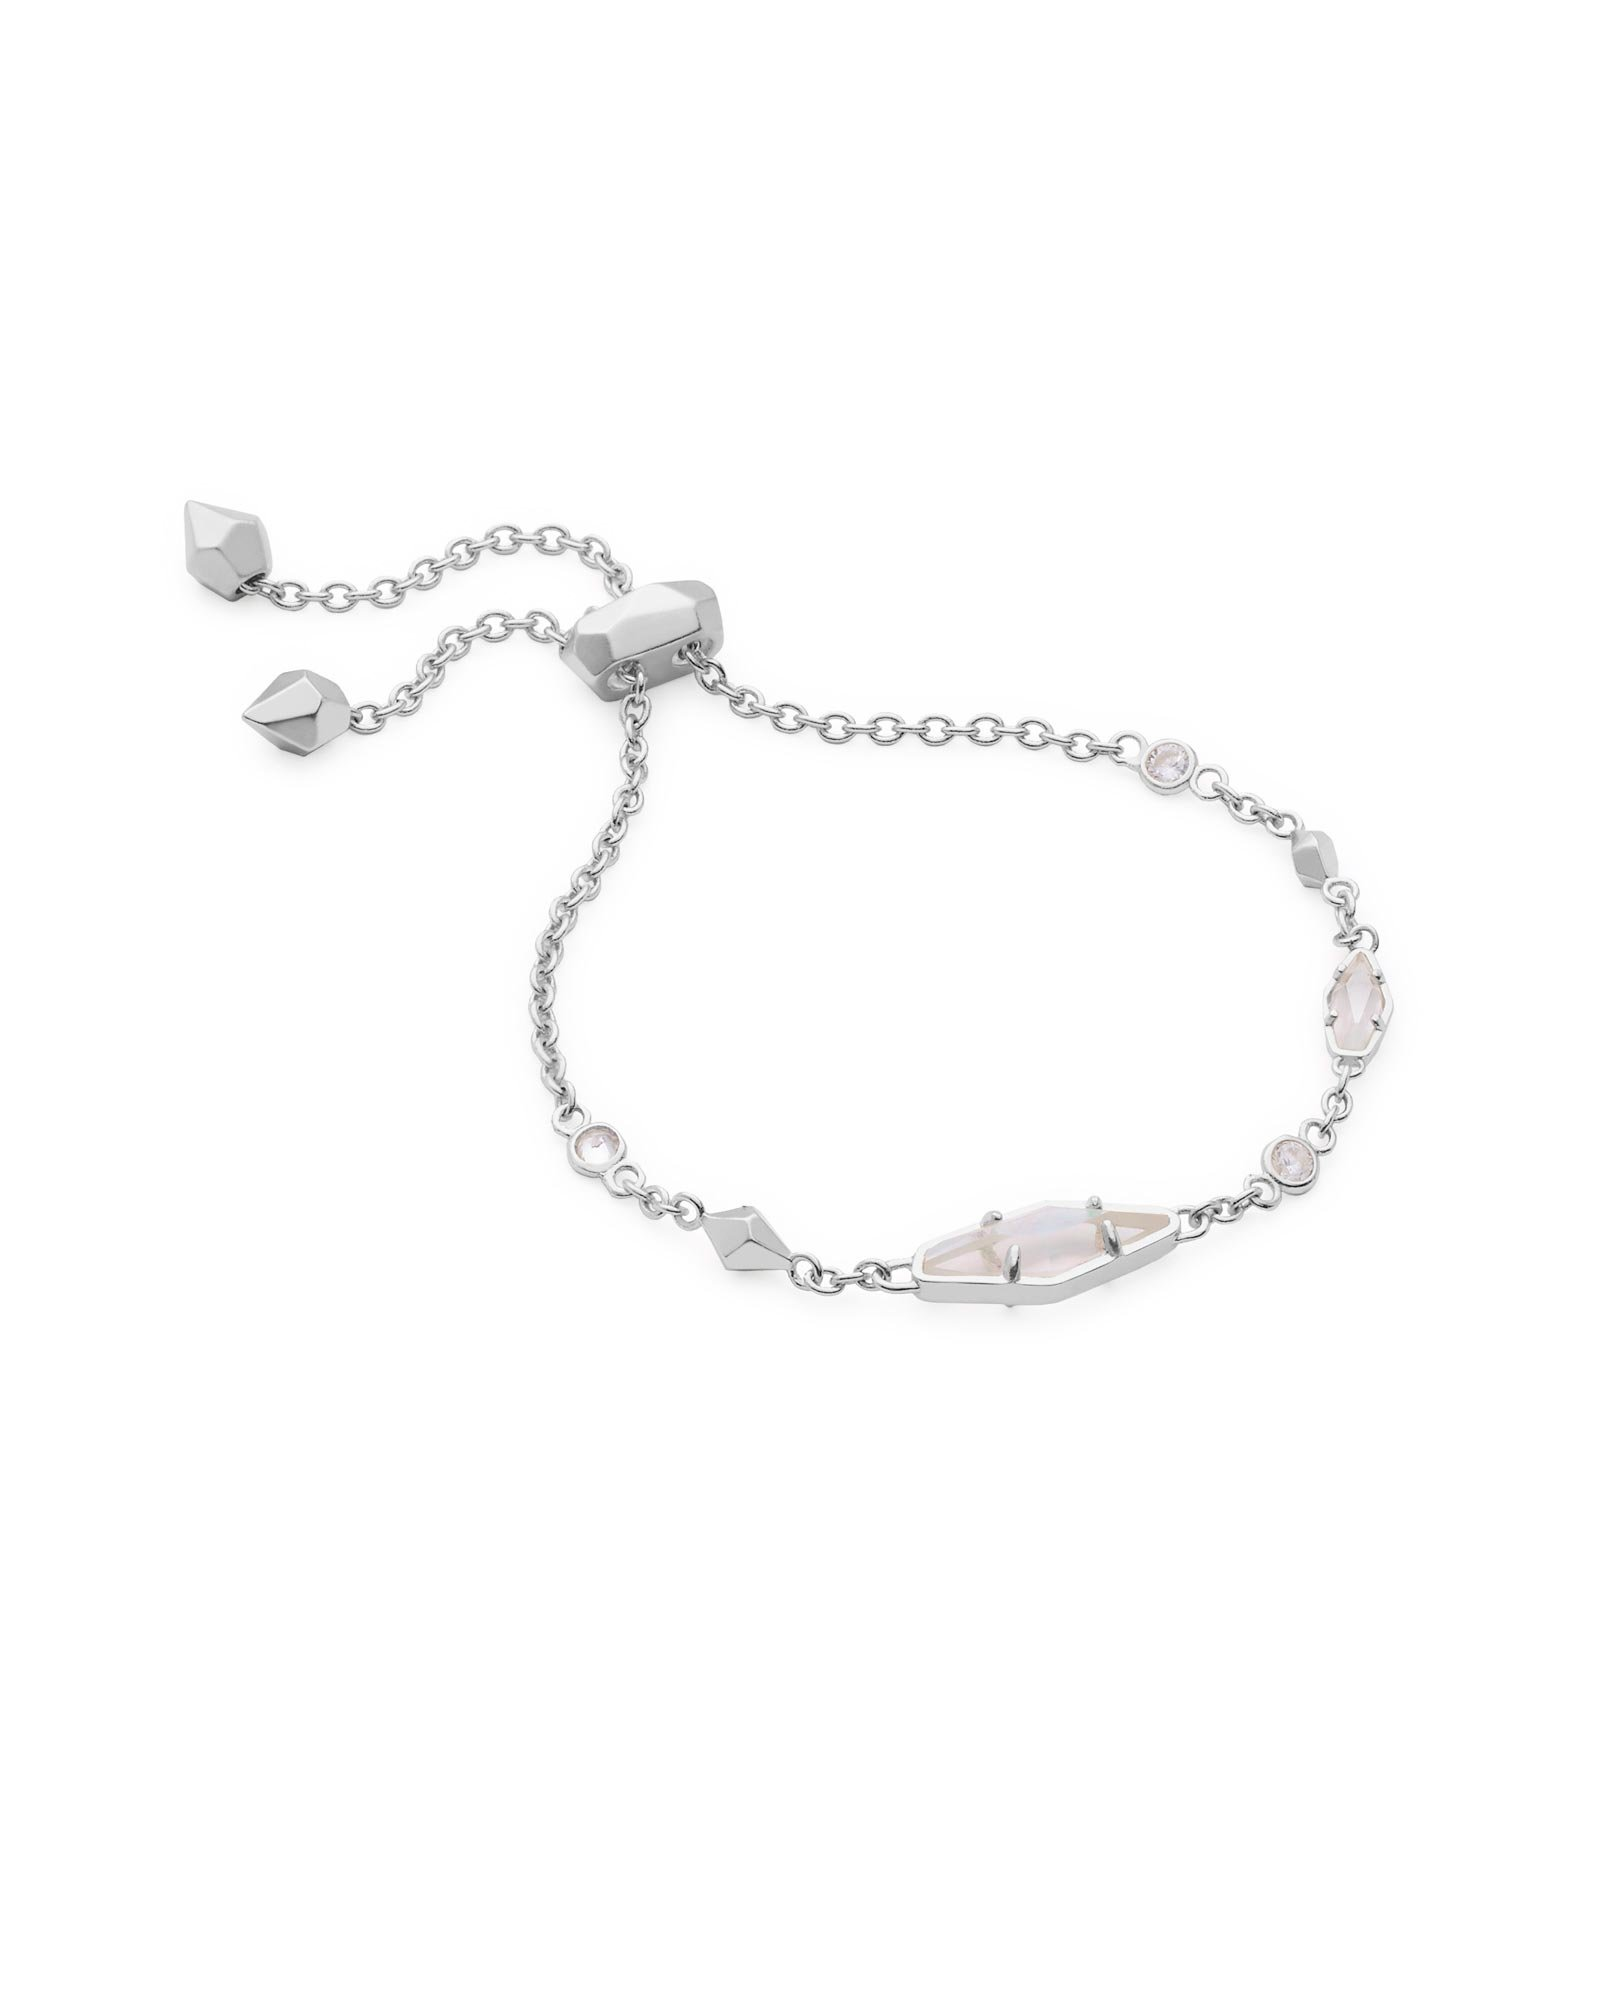 Kendra Scott Deb Adjustable Chain Bracelet (Rhodium)